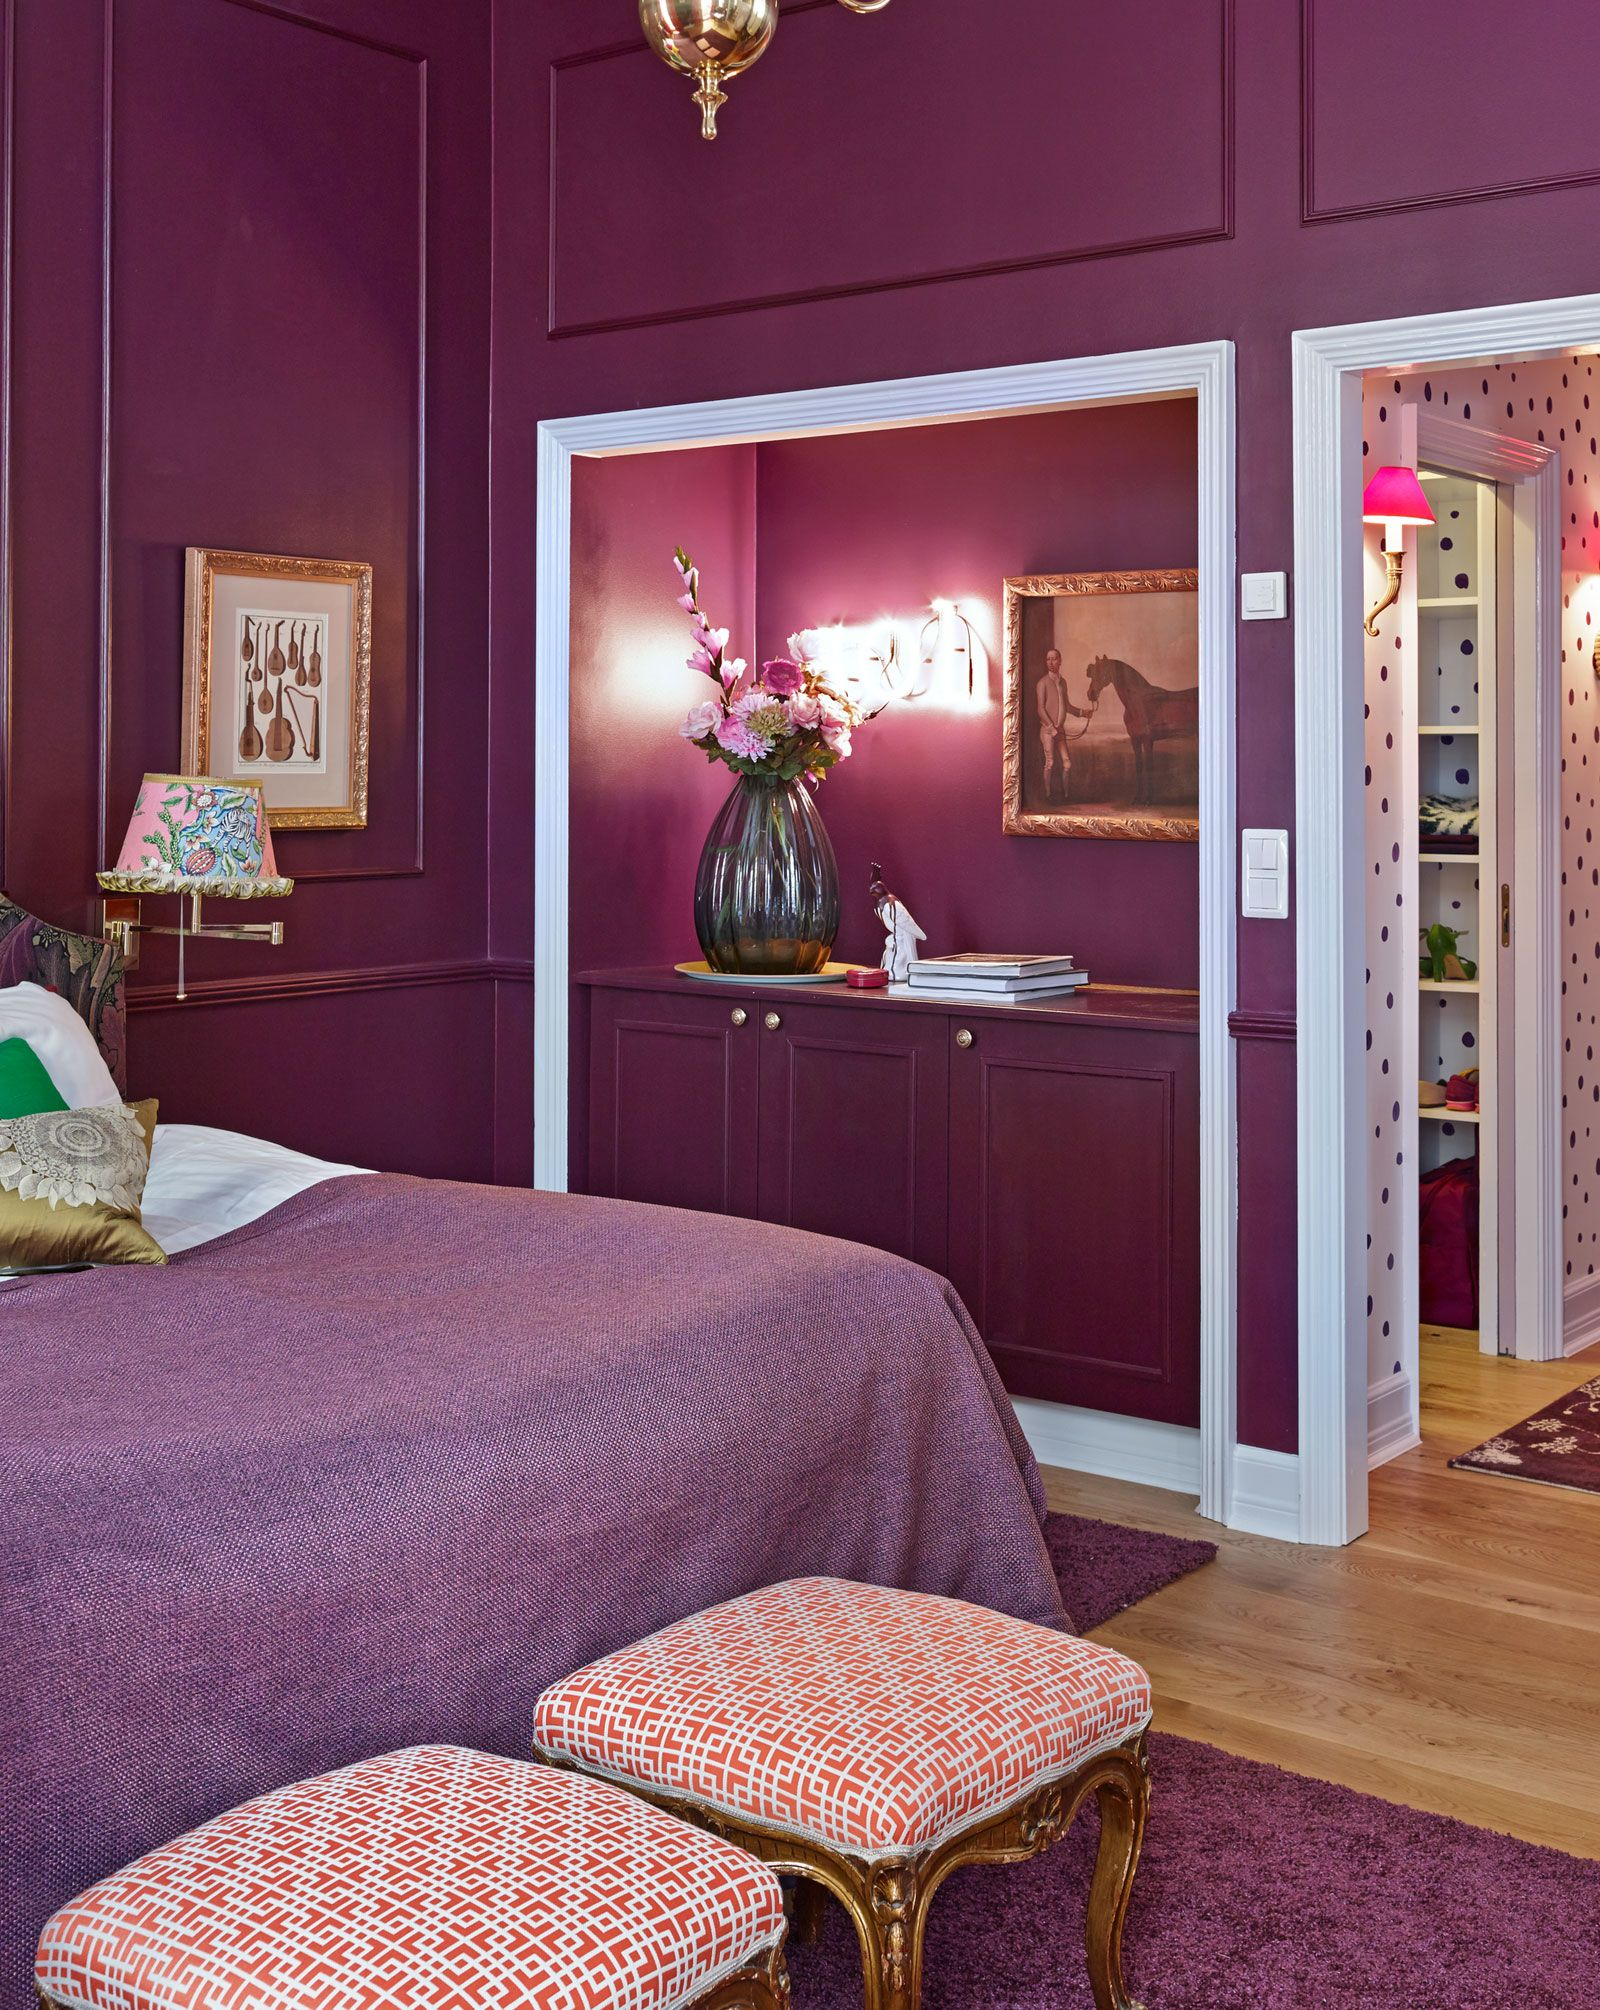 Luxury Hotel Bedrooms: Luxury Oslo Accommodation